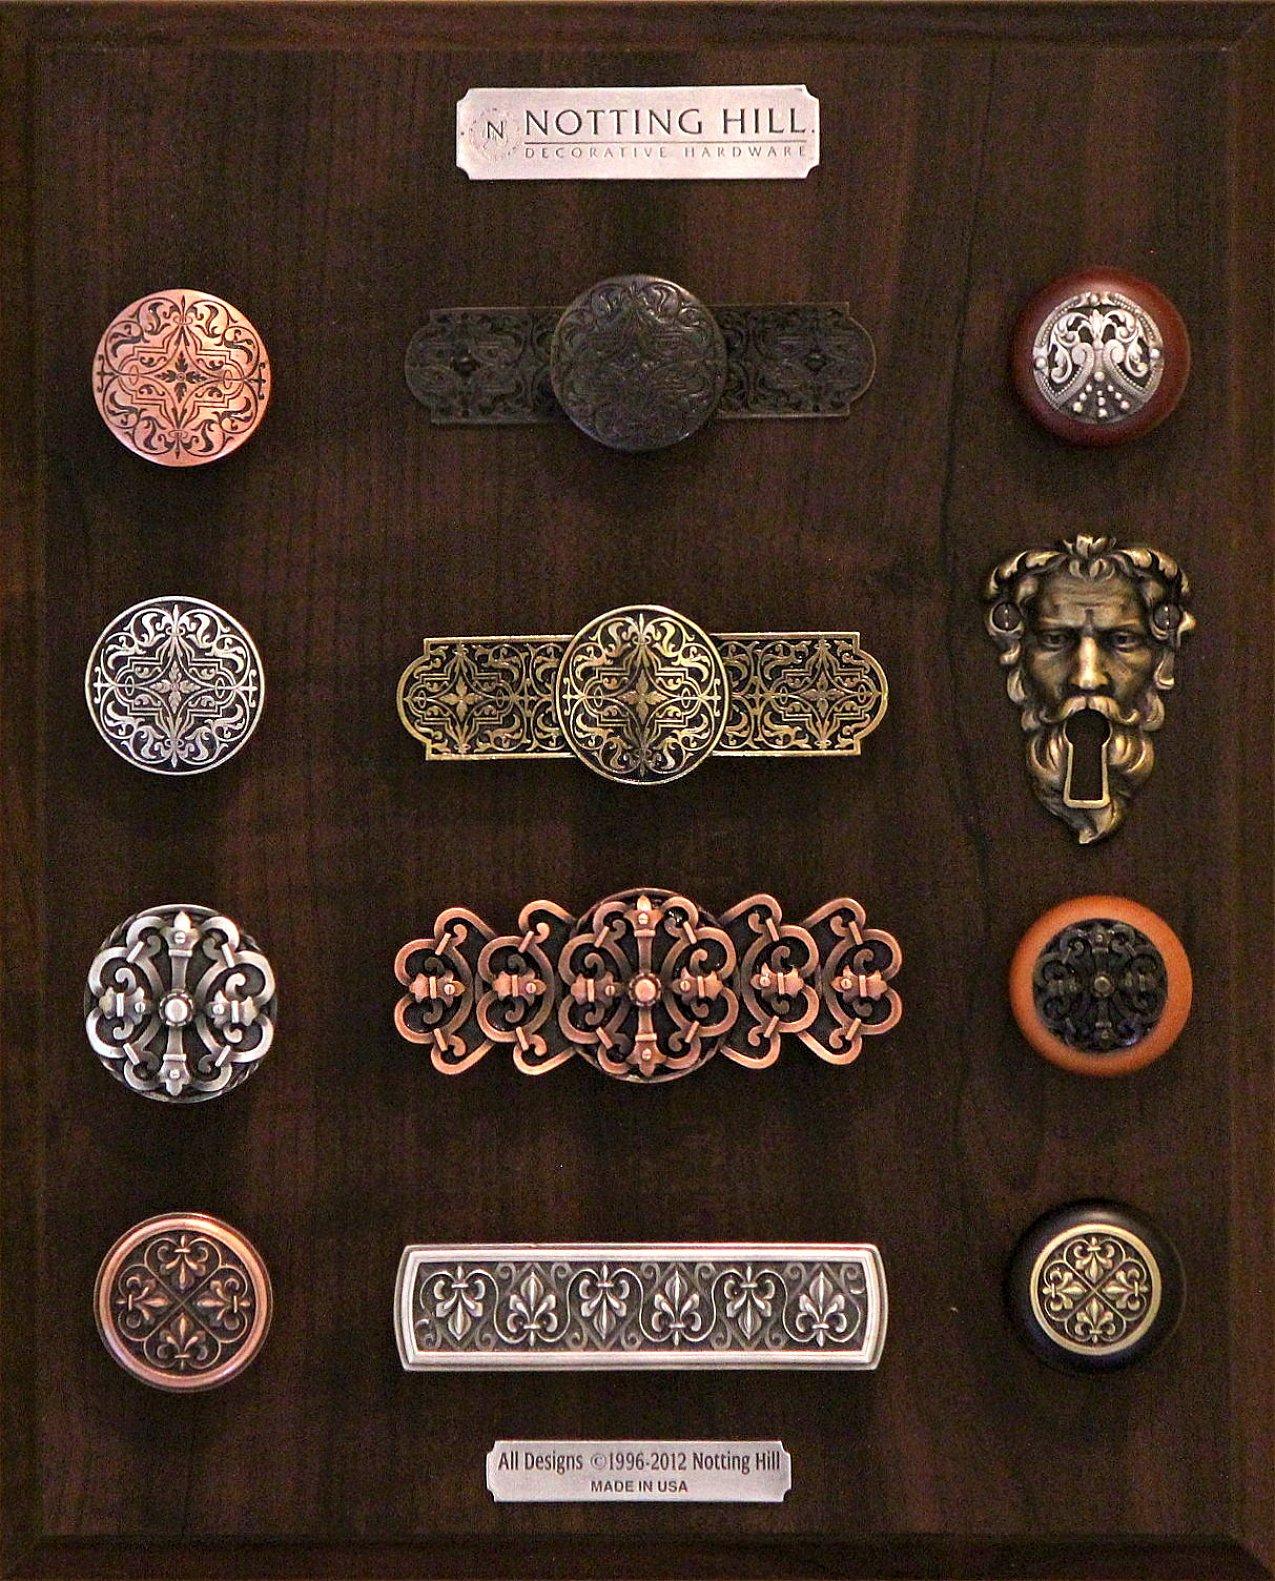 Renaissance Etch Knob, Renaissance Etch Knob & Back Plate; Regal Crest Wood Knob; Renaissance Knob, Renaissance Pull; Sentinel Key Escutcheon, Chateau Knob, Pull, Wood Knob; Fleur-de-Lis Knob, Pull, Wood Knob.